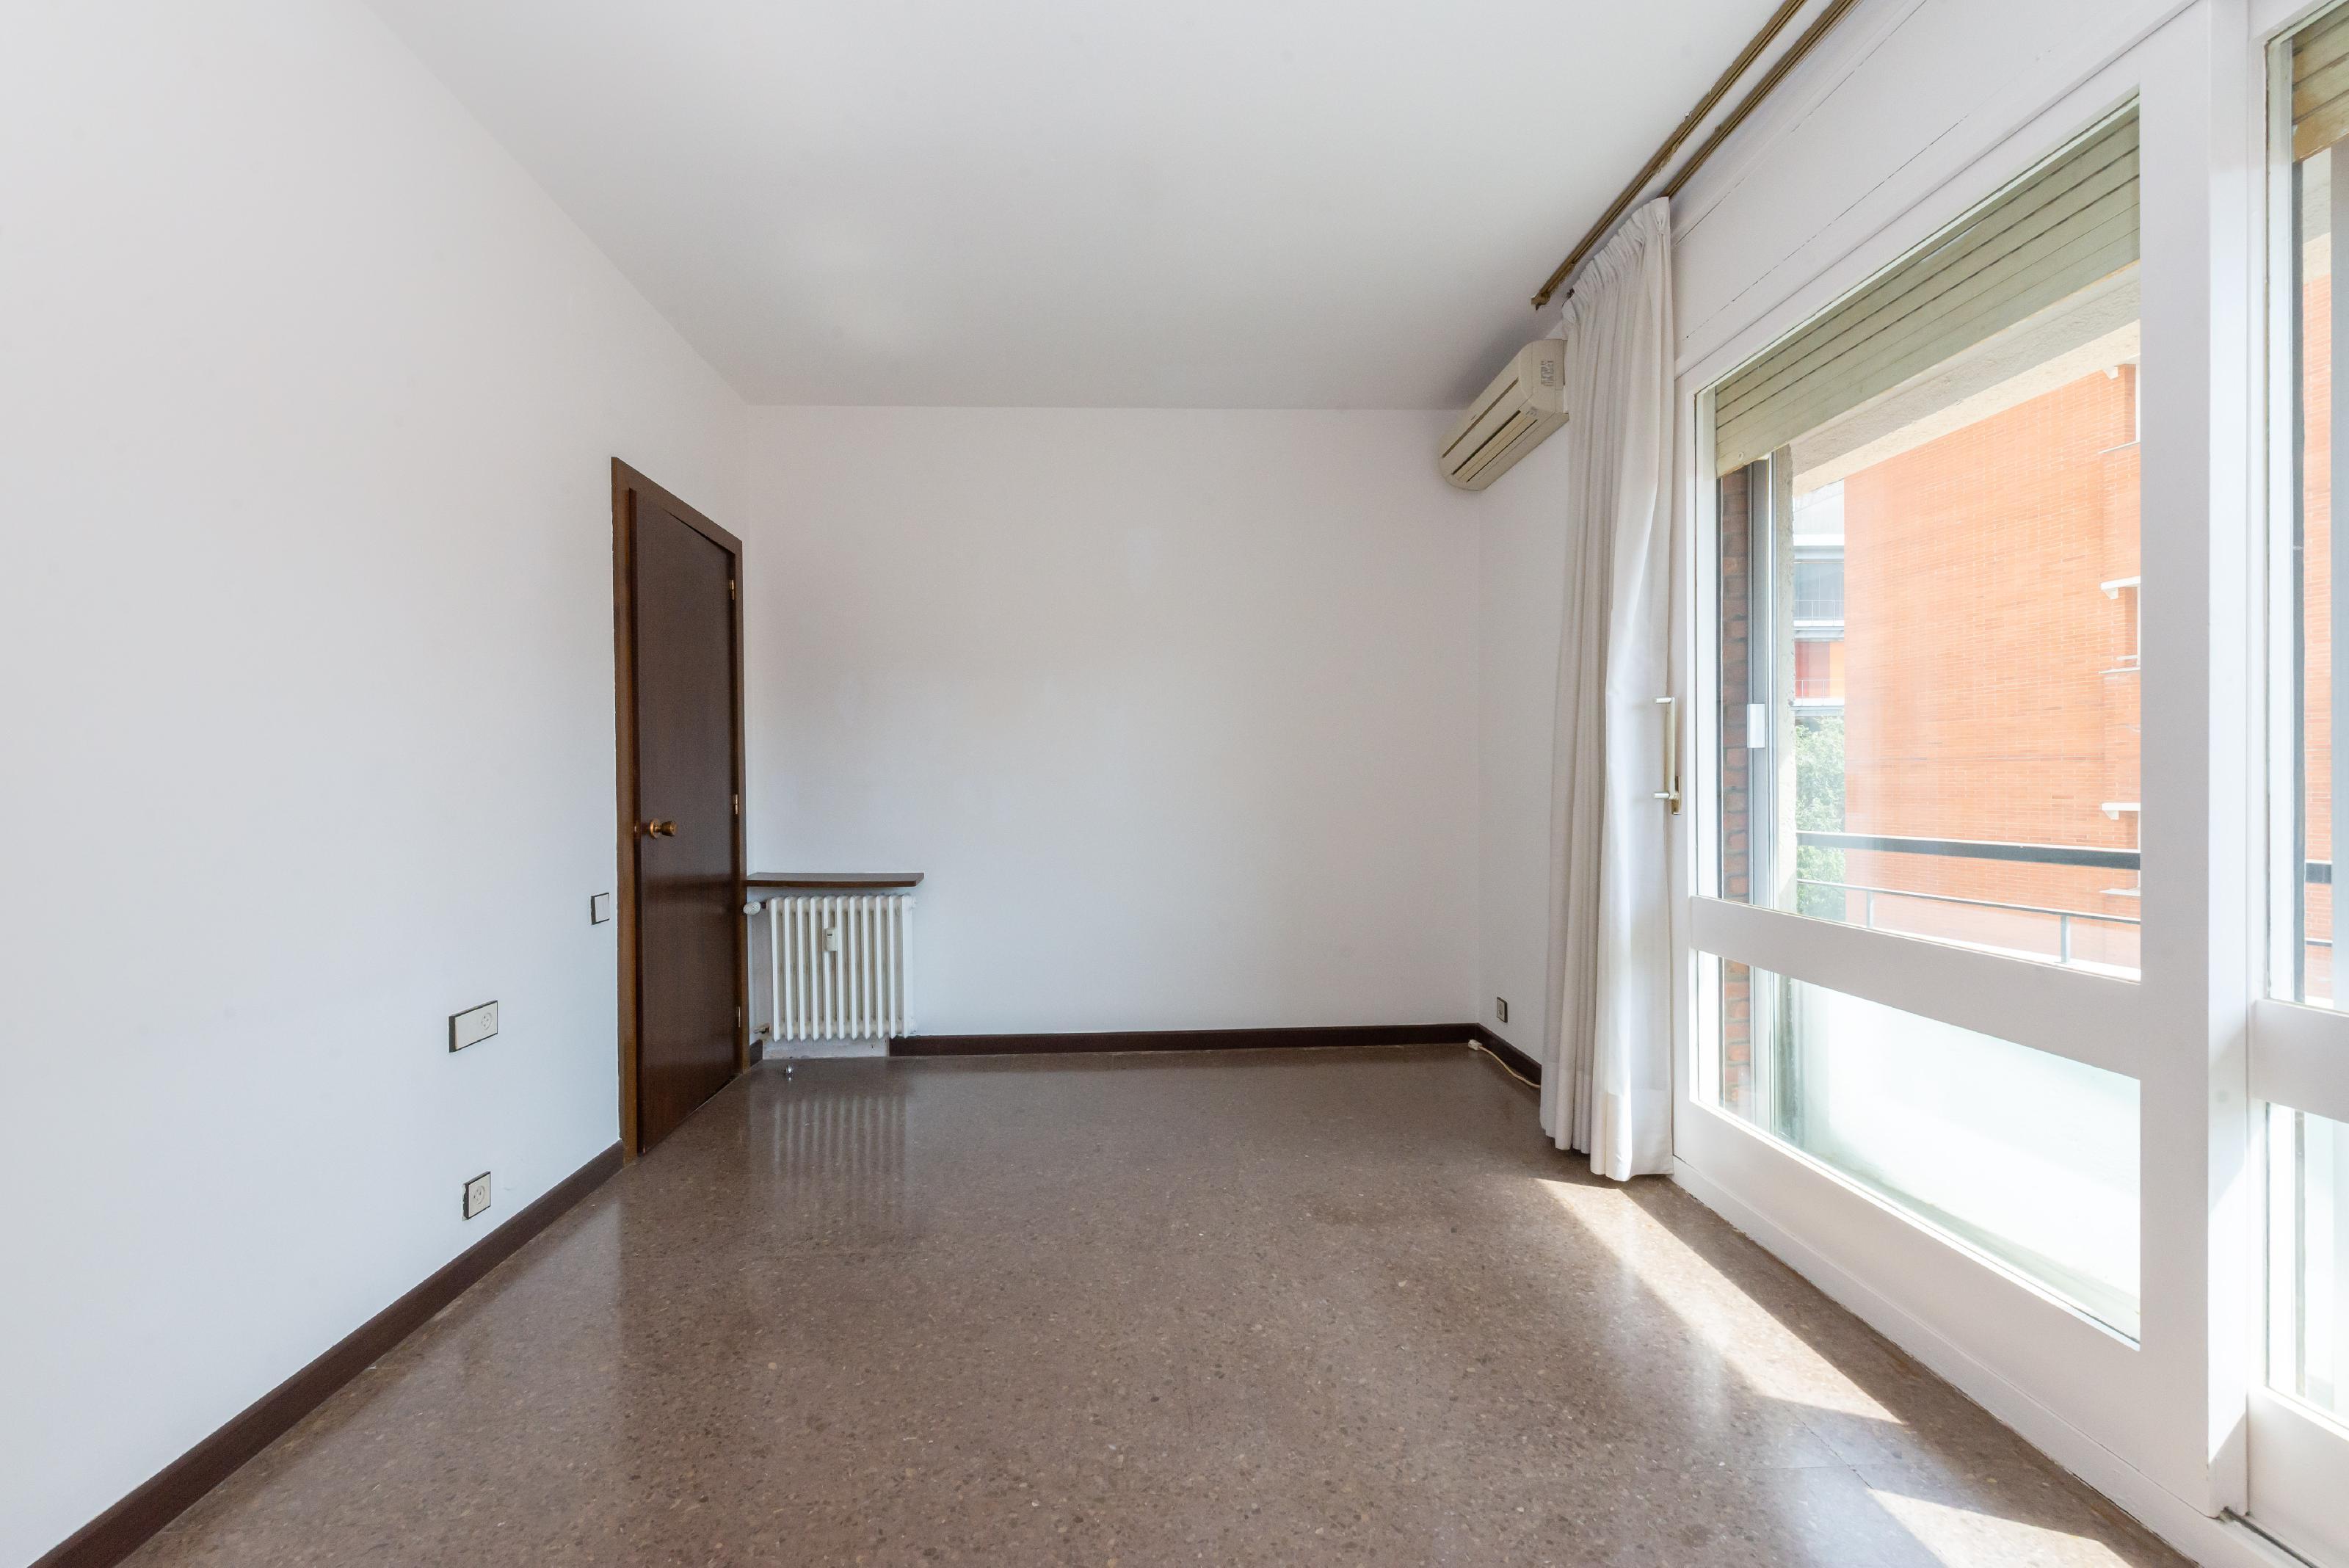 253470 Flat for sale in Sarrià-Sant Gervasi, El Putxet and Farró 3